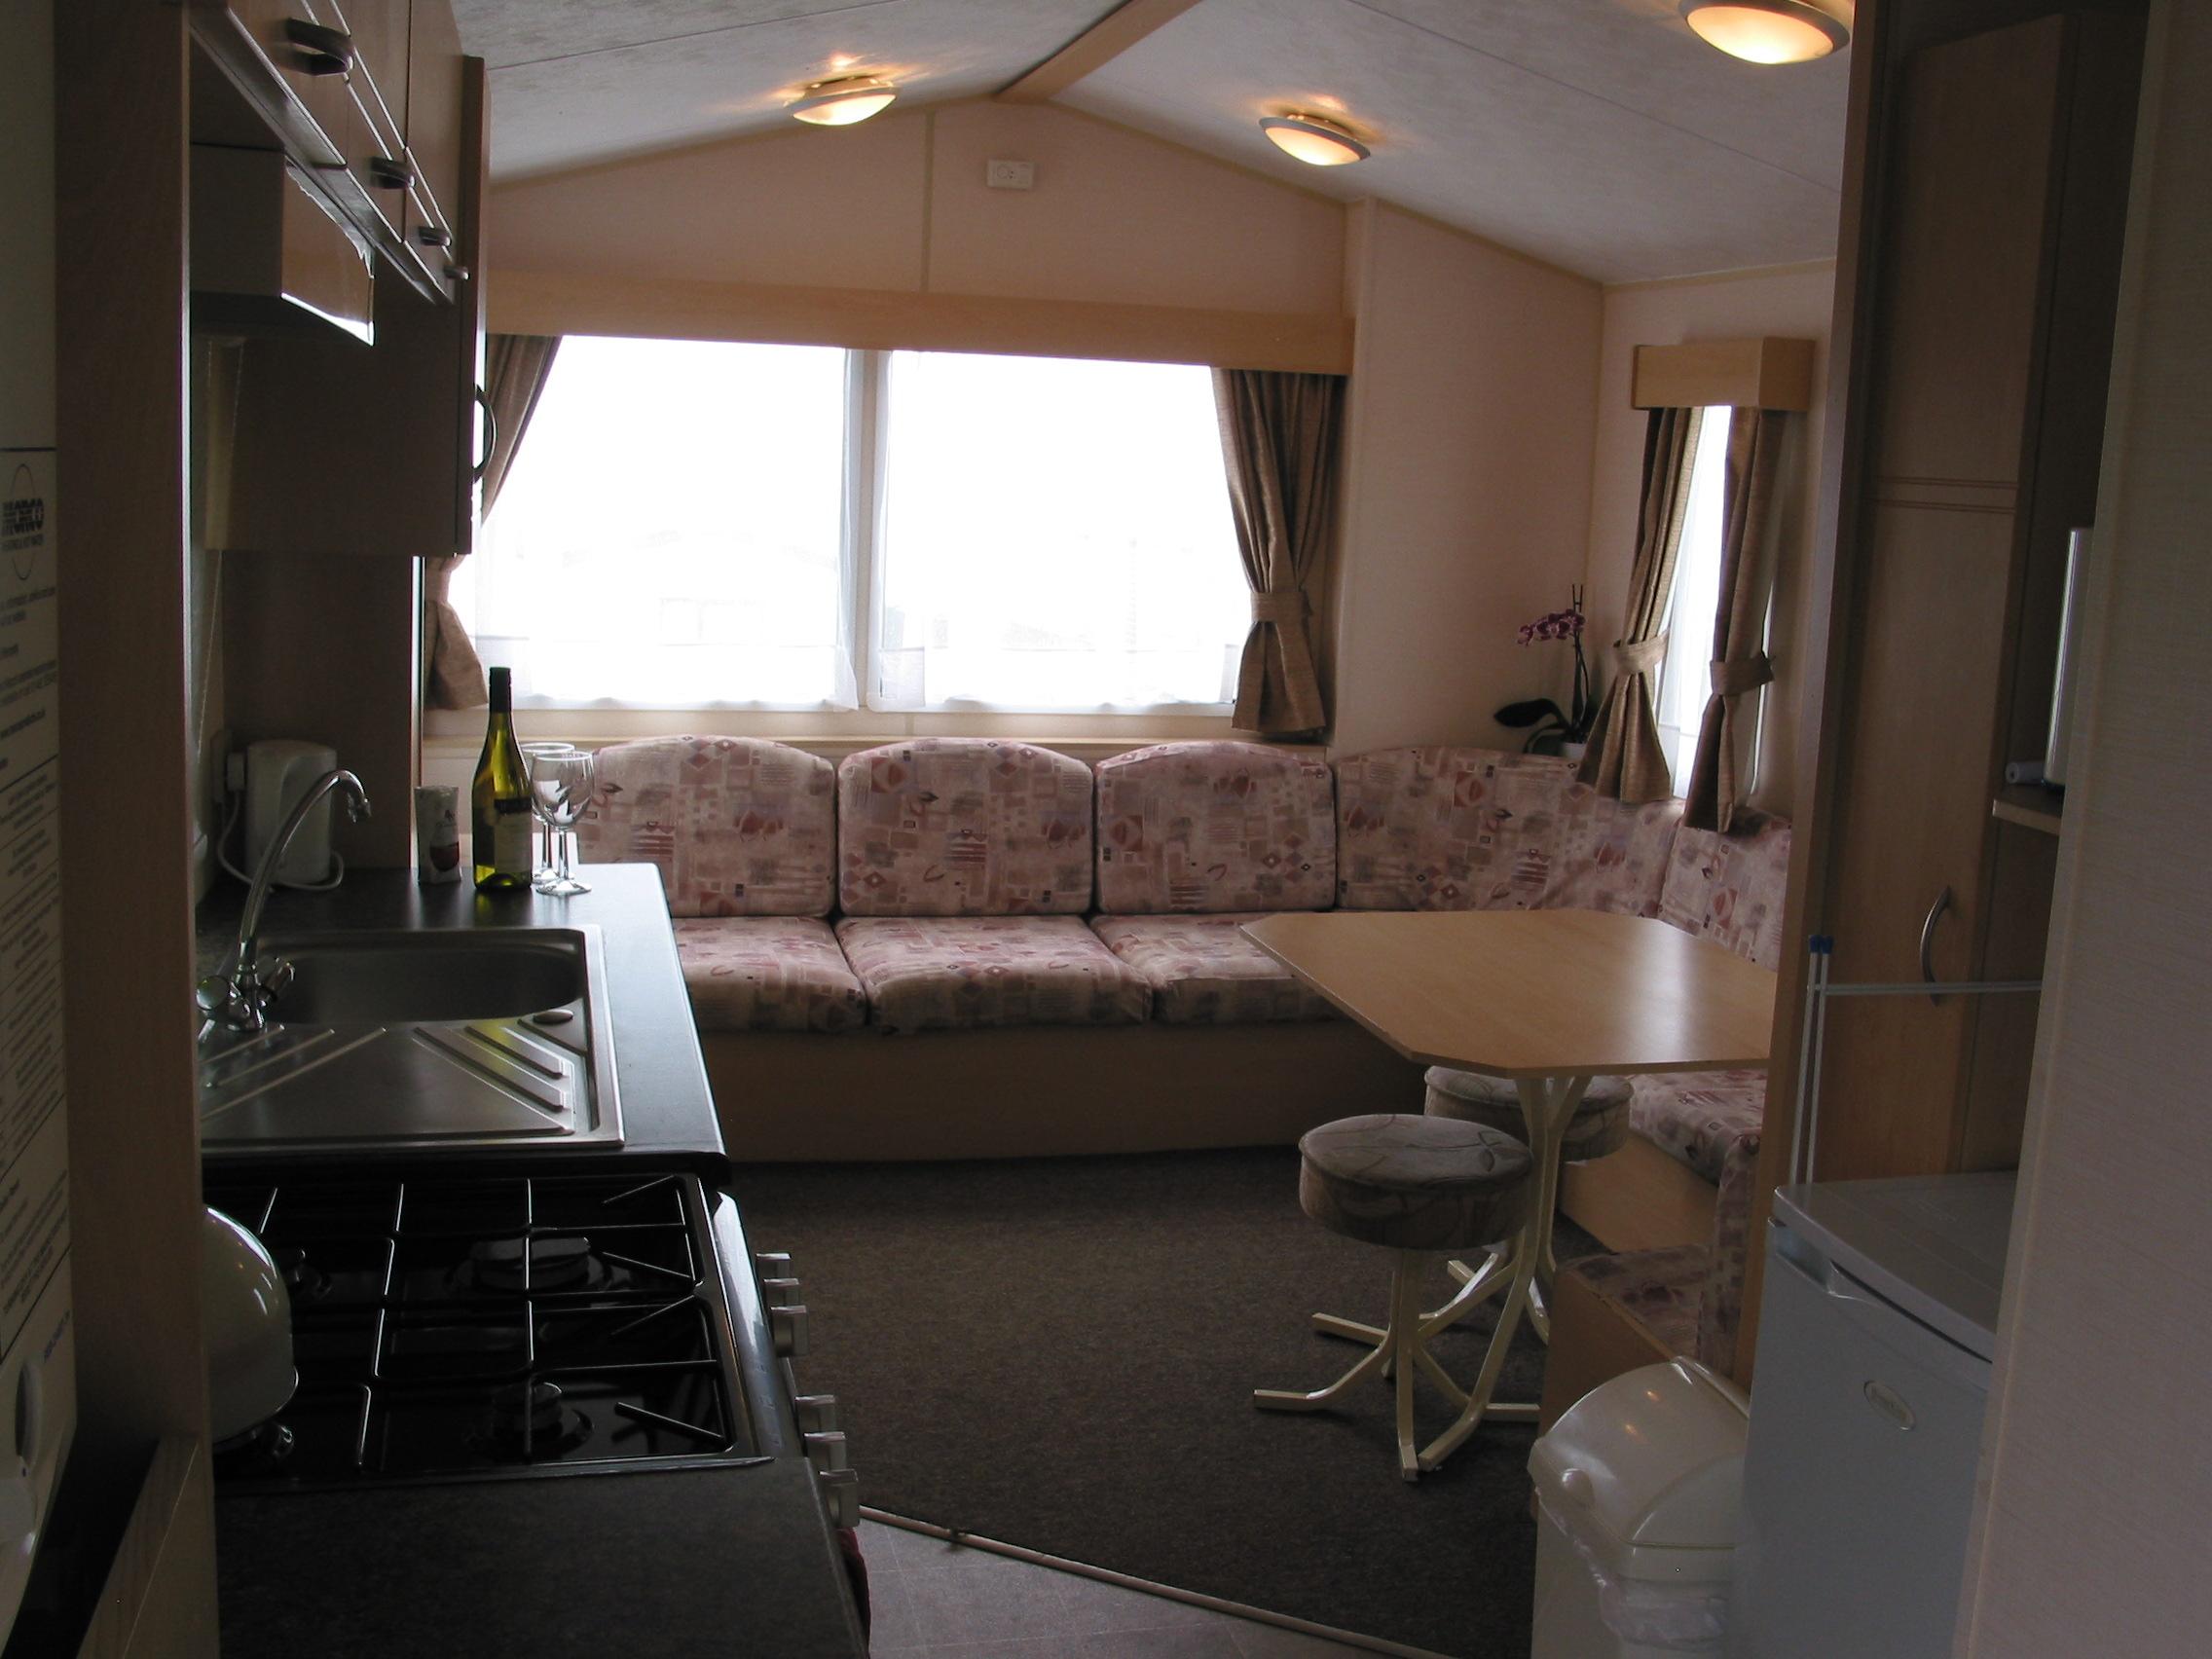 CV 66 living room